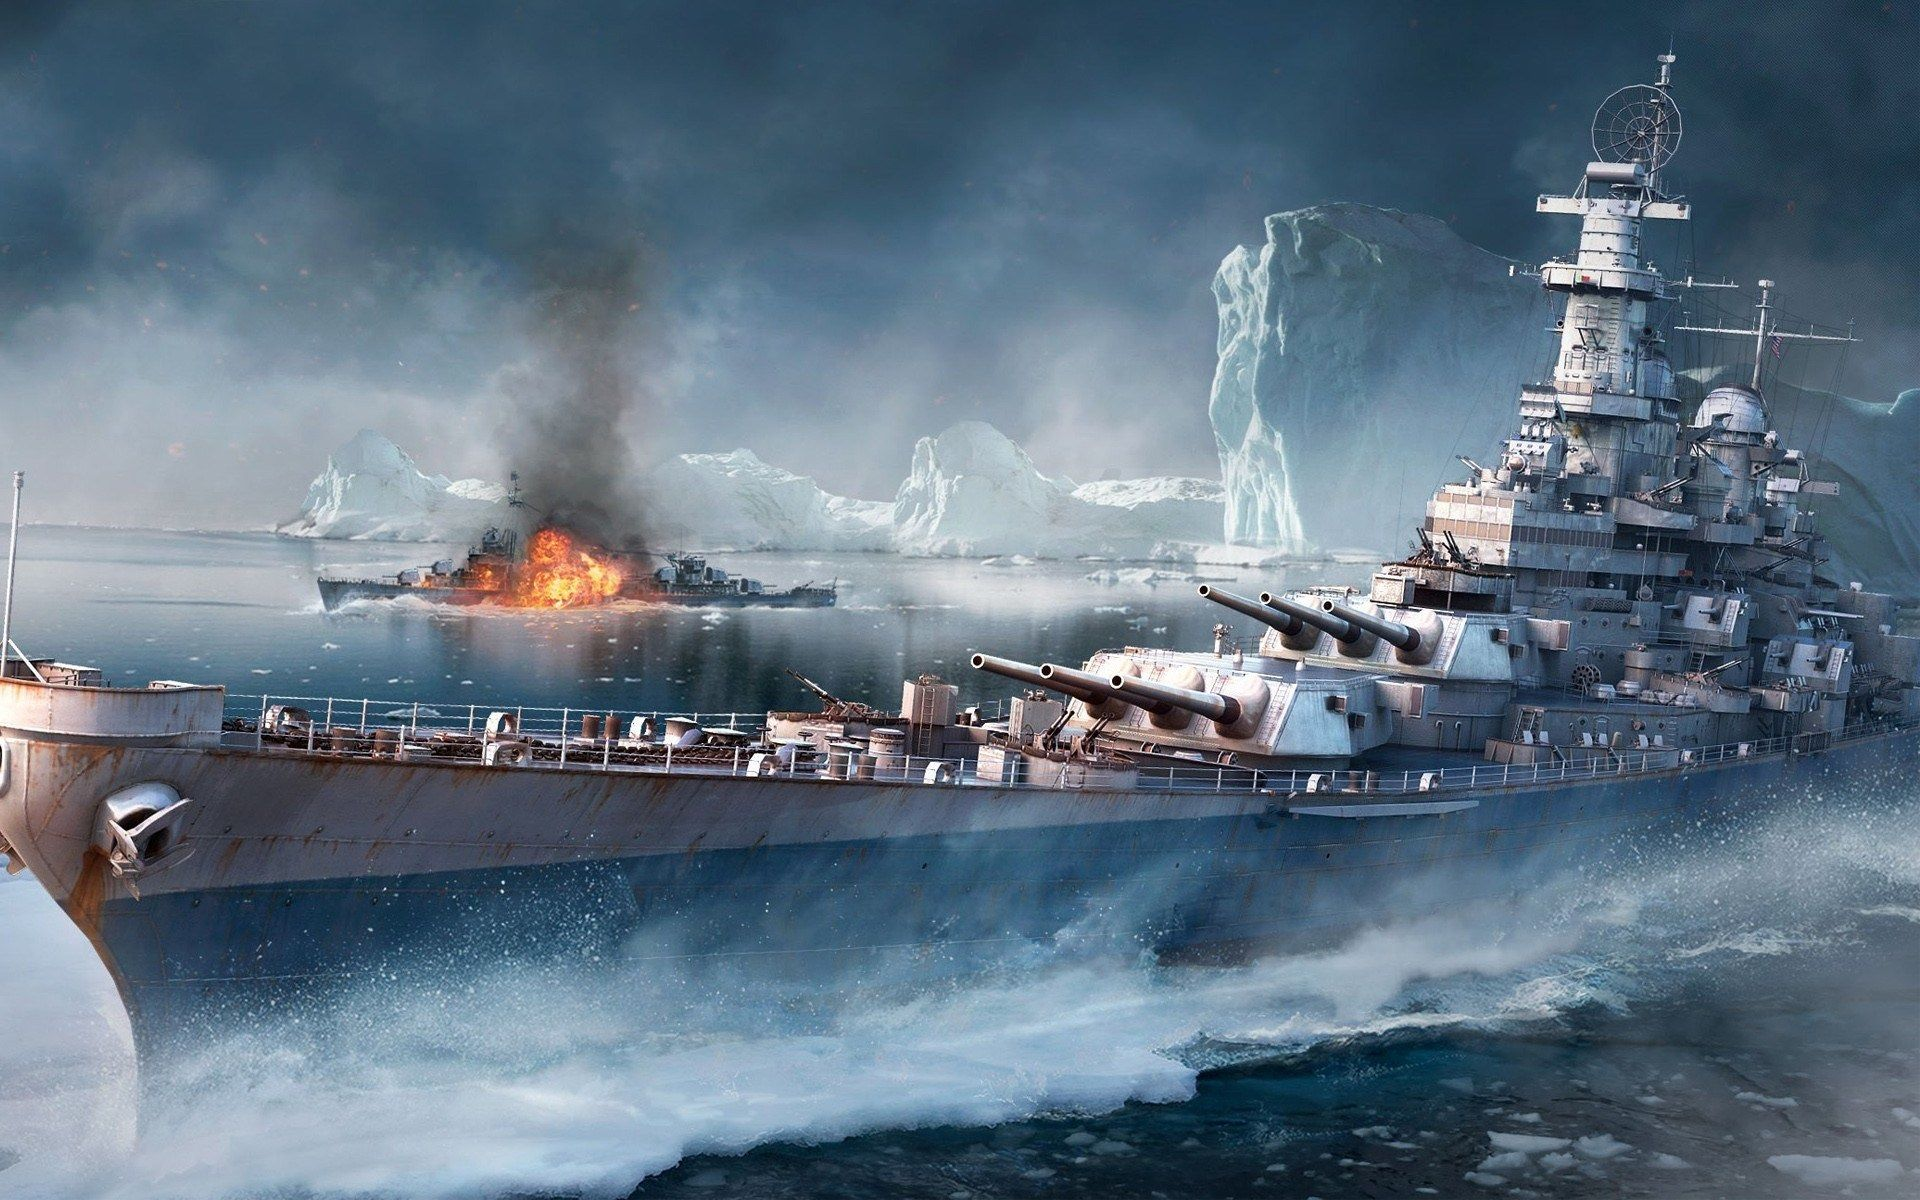 ww2 submarine wallpaper | gdlawct